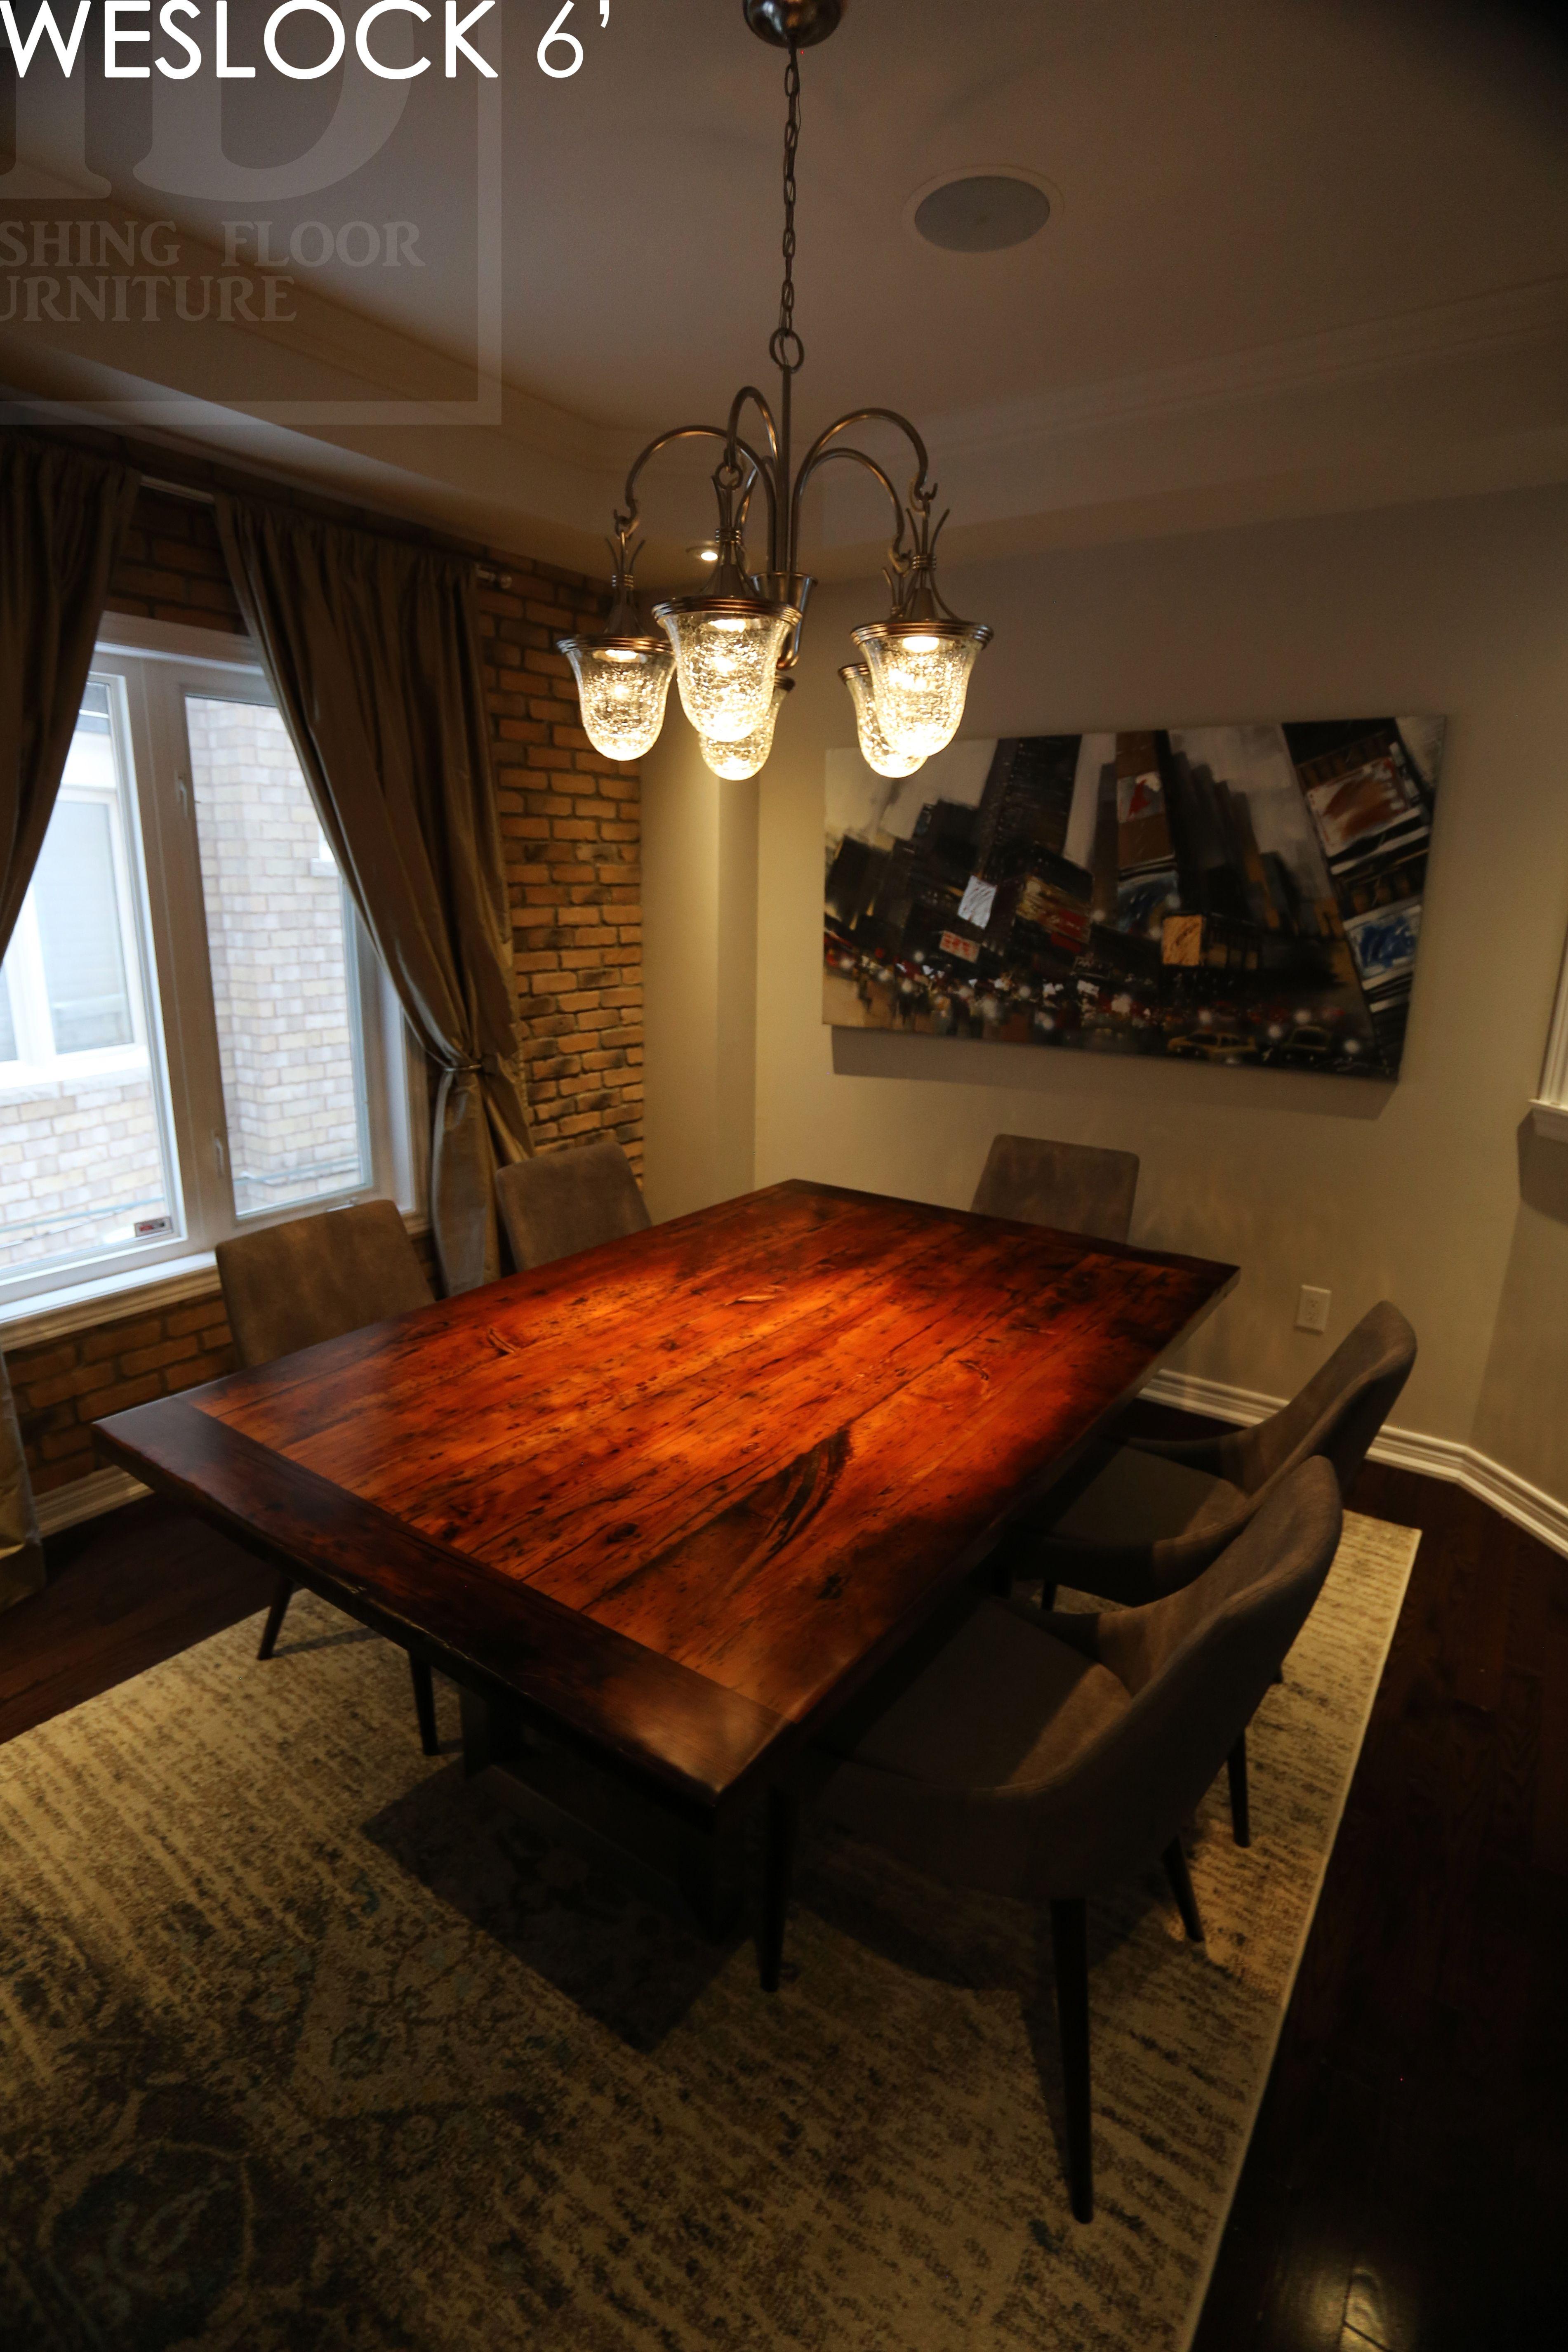 Reclaimed Wood Harvest Table By Hd Threshing Floor Furniture Of